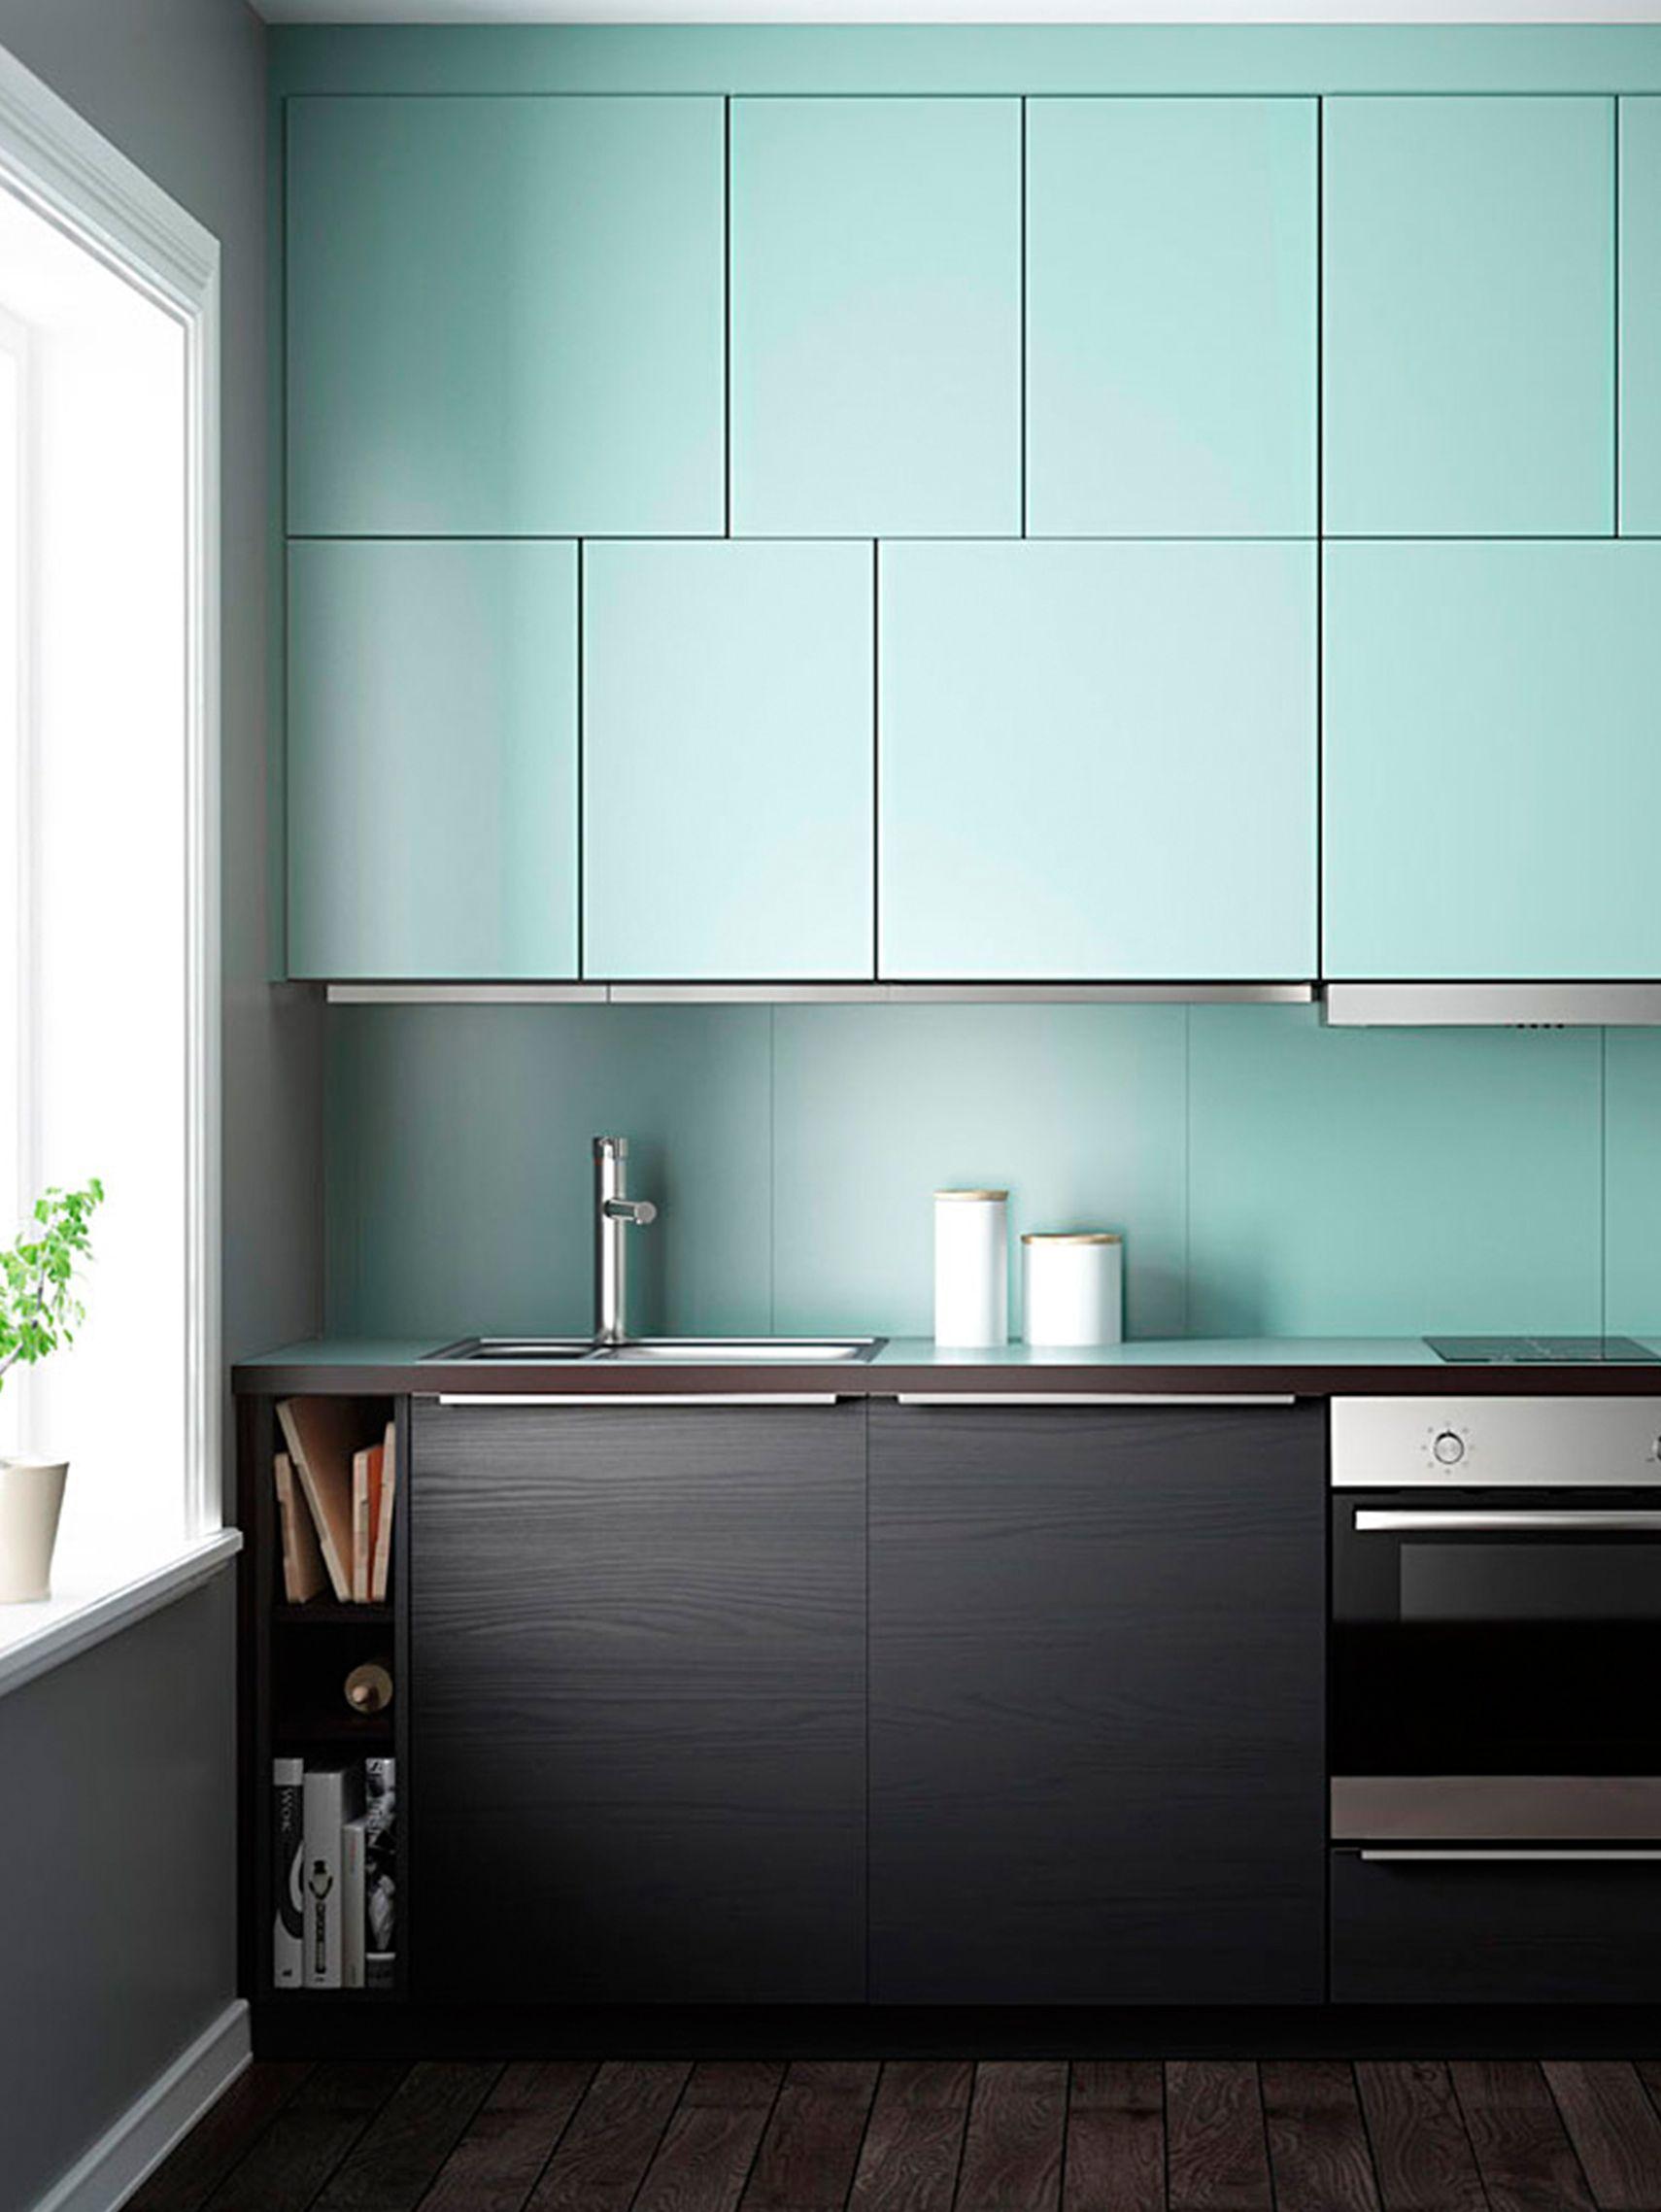 Pin by Juan el Autista on Domum | Pinterest | Kitchen design ...